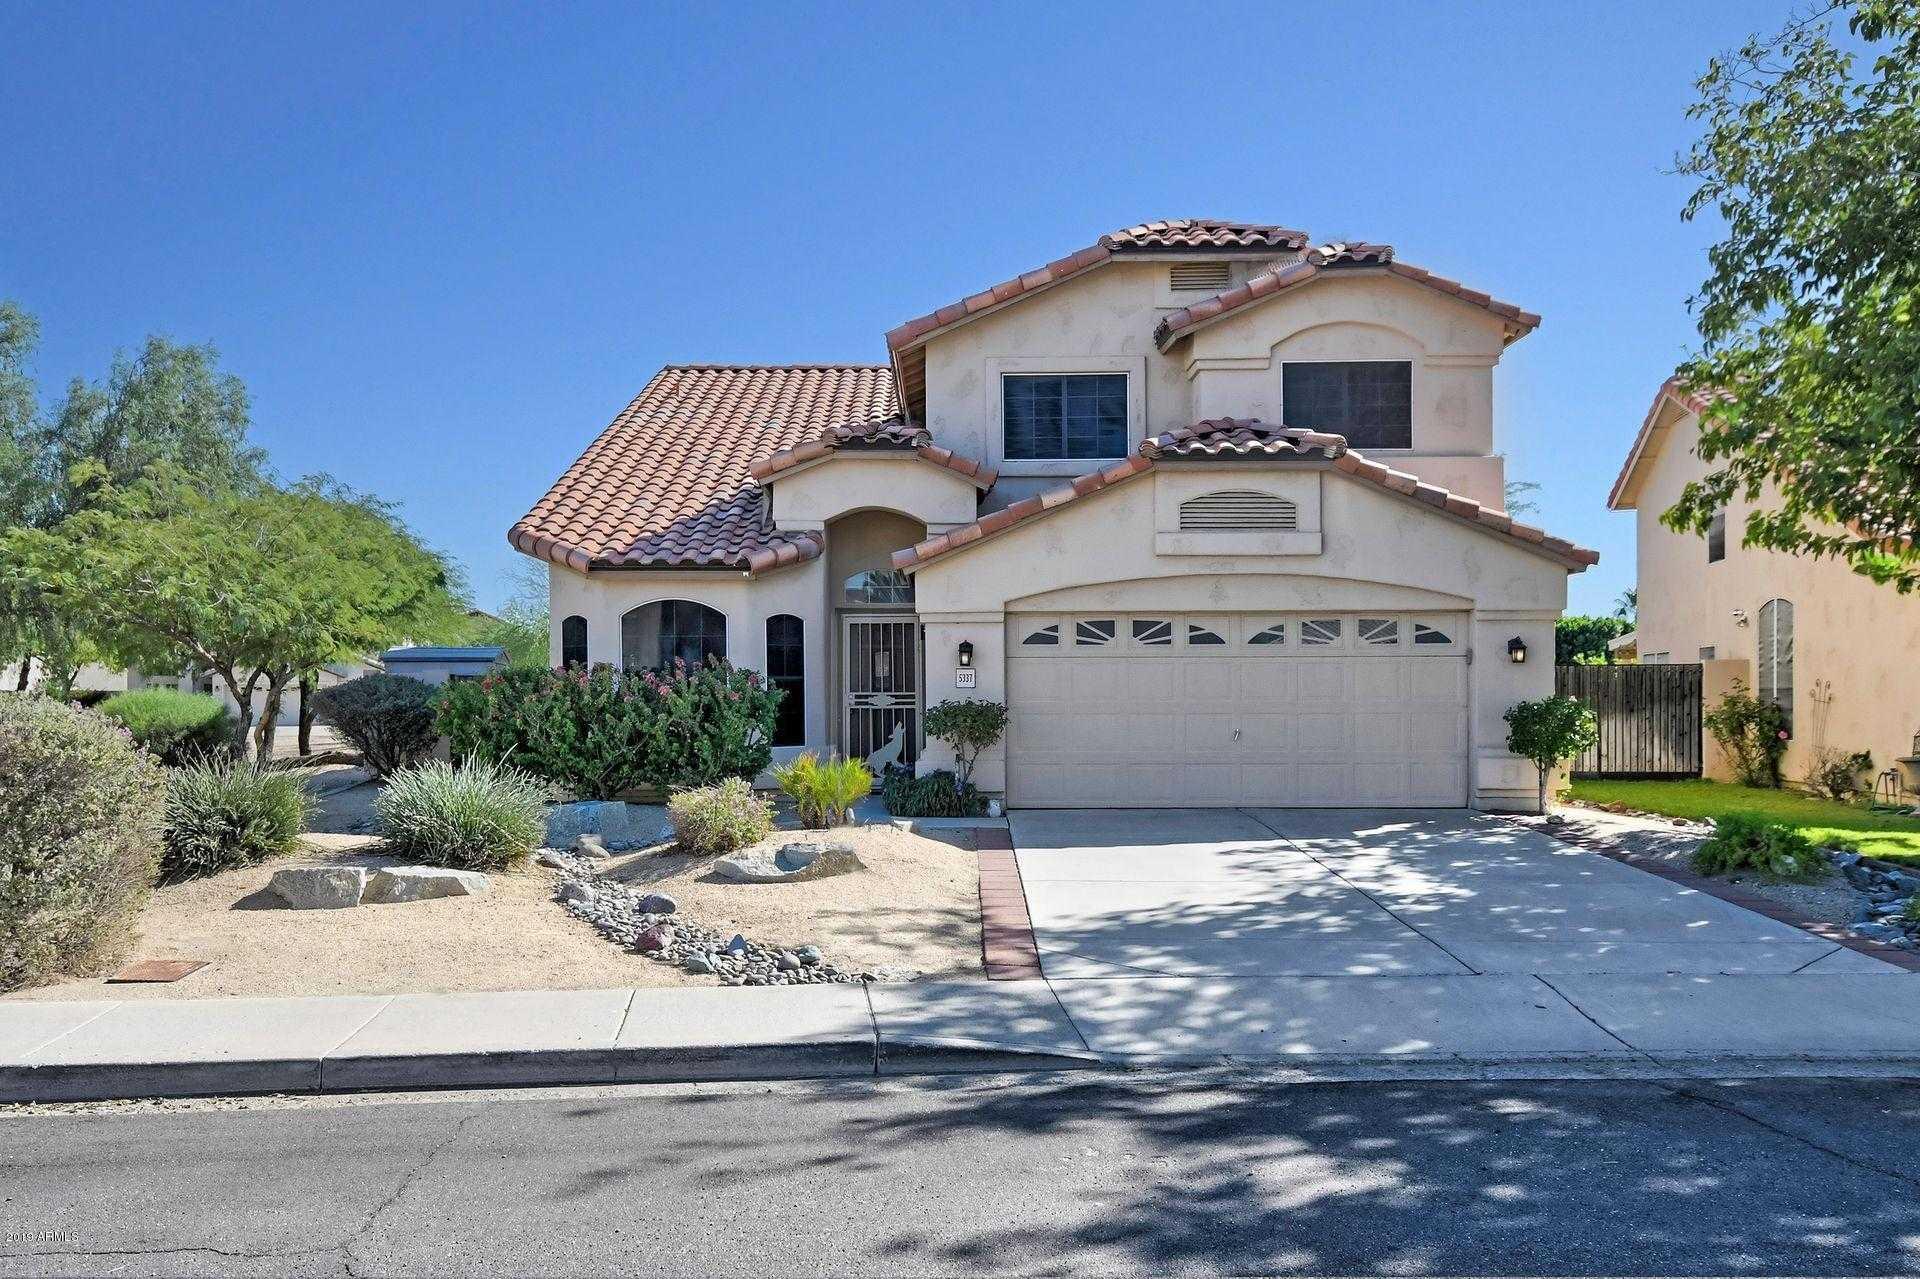 $327,900 - 4Br/3Ba - Home for Sale in Carmel Park Lot 1-269 Tr A,b, Glendale